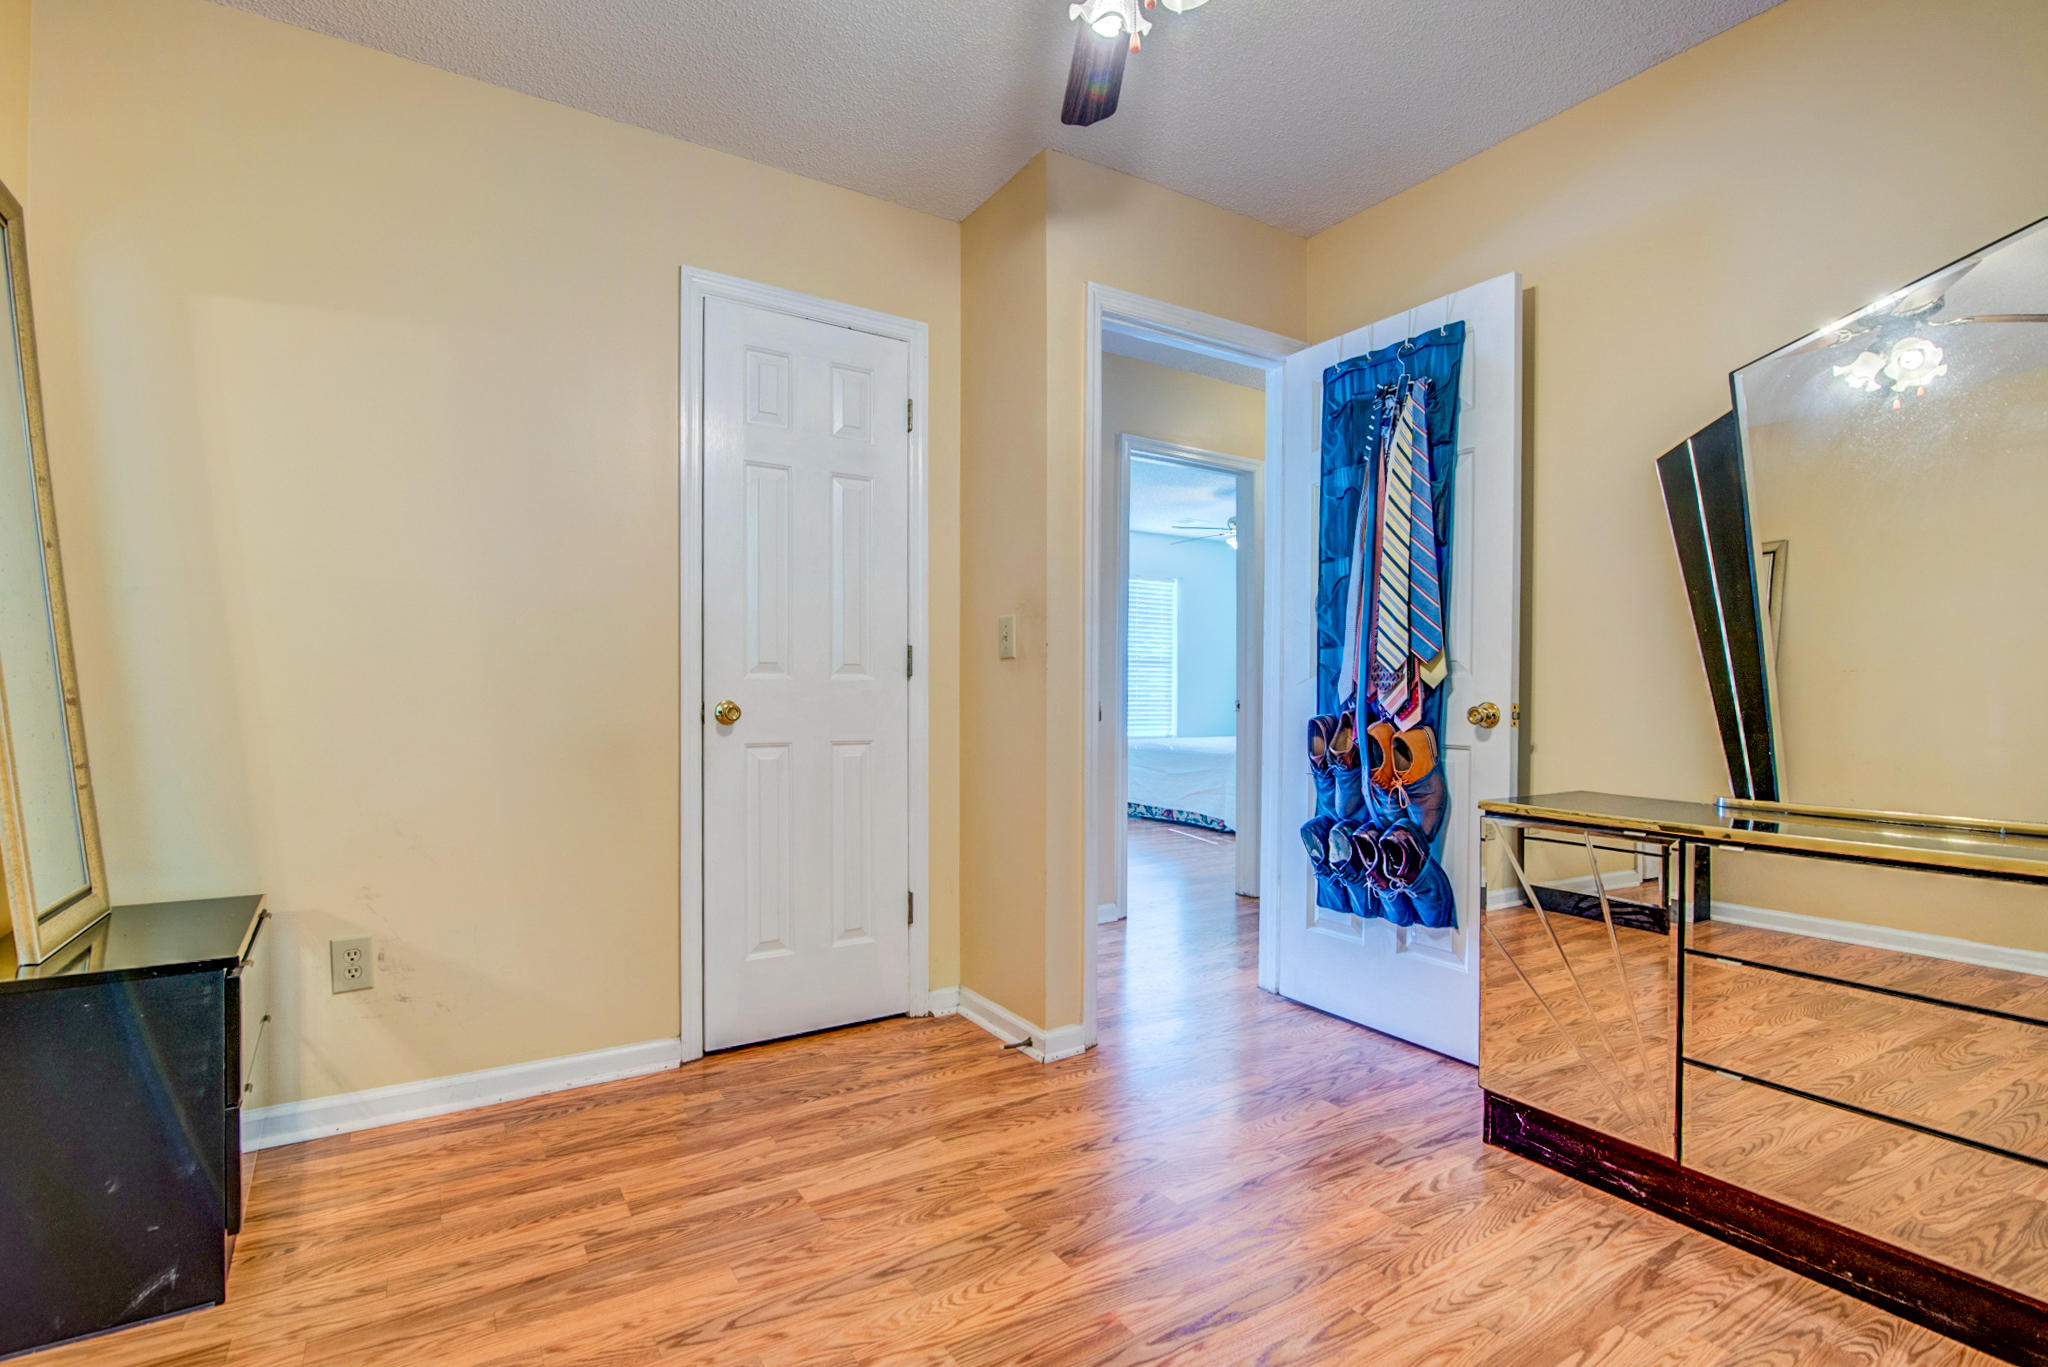 Woodlands Homes For Sale - 30 Palmetto Park, Charleston, SC - 15